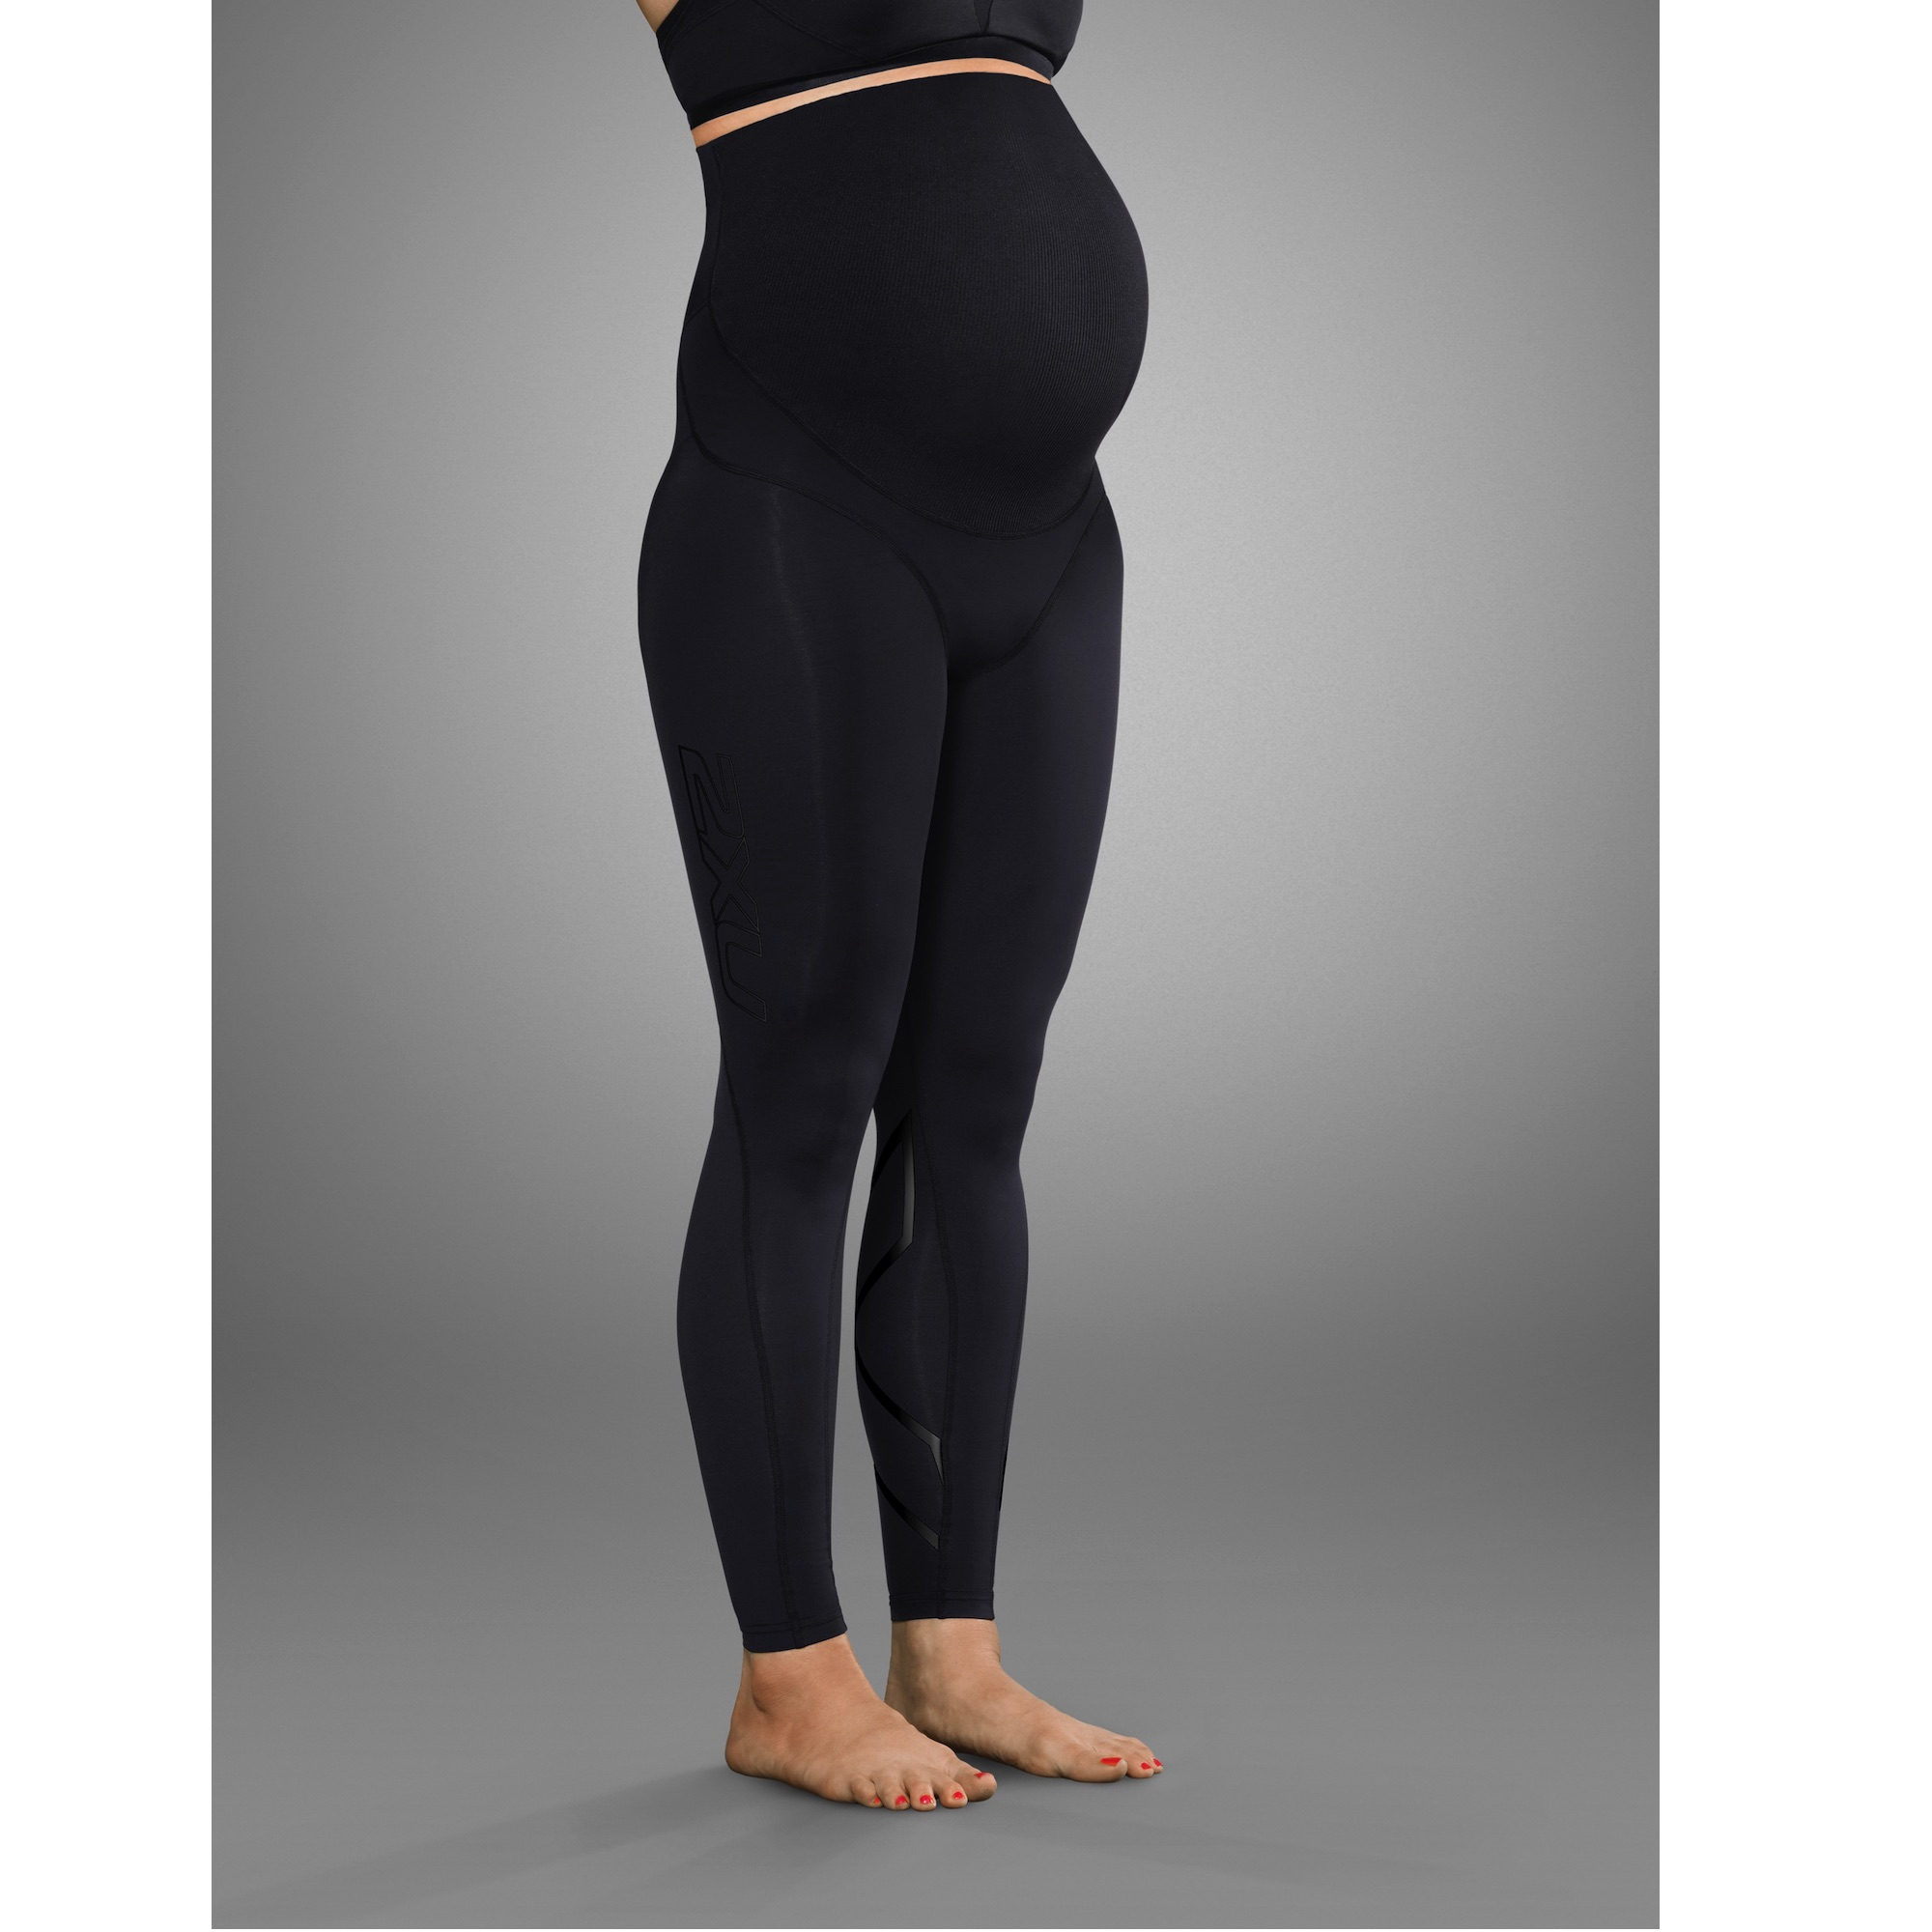 5ceeb80278f4c 2XU Prenatal Active Maternity Tights | DueSoon Australia